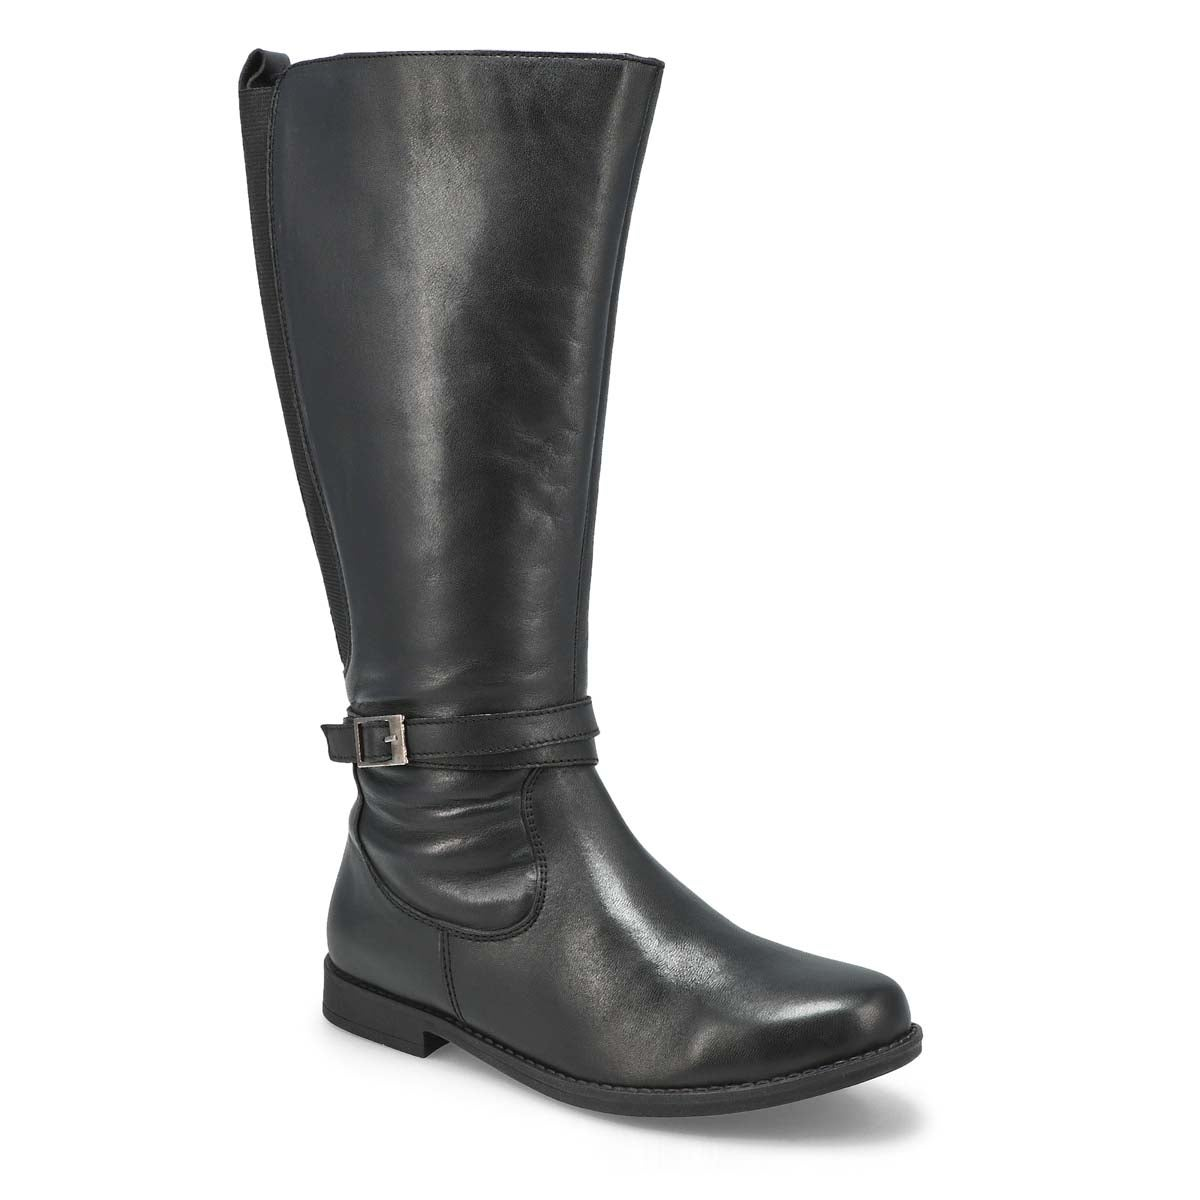 Lds Danifa black mid calf boot